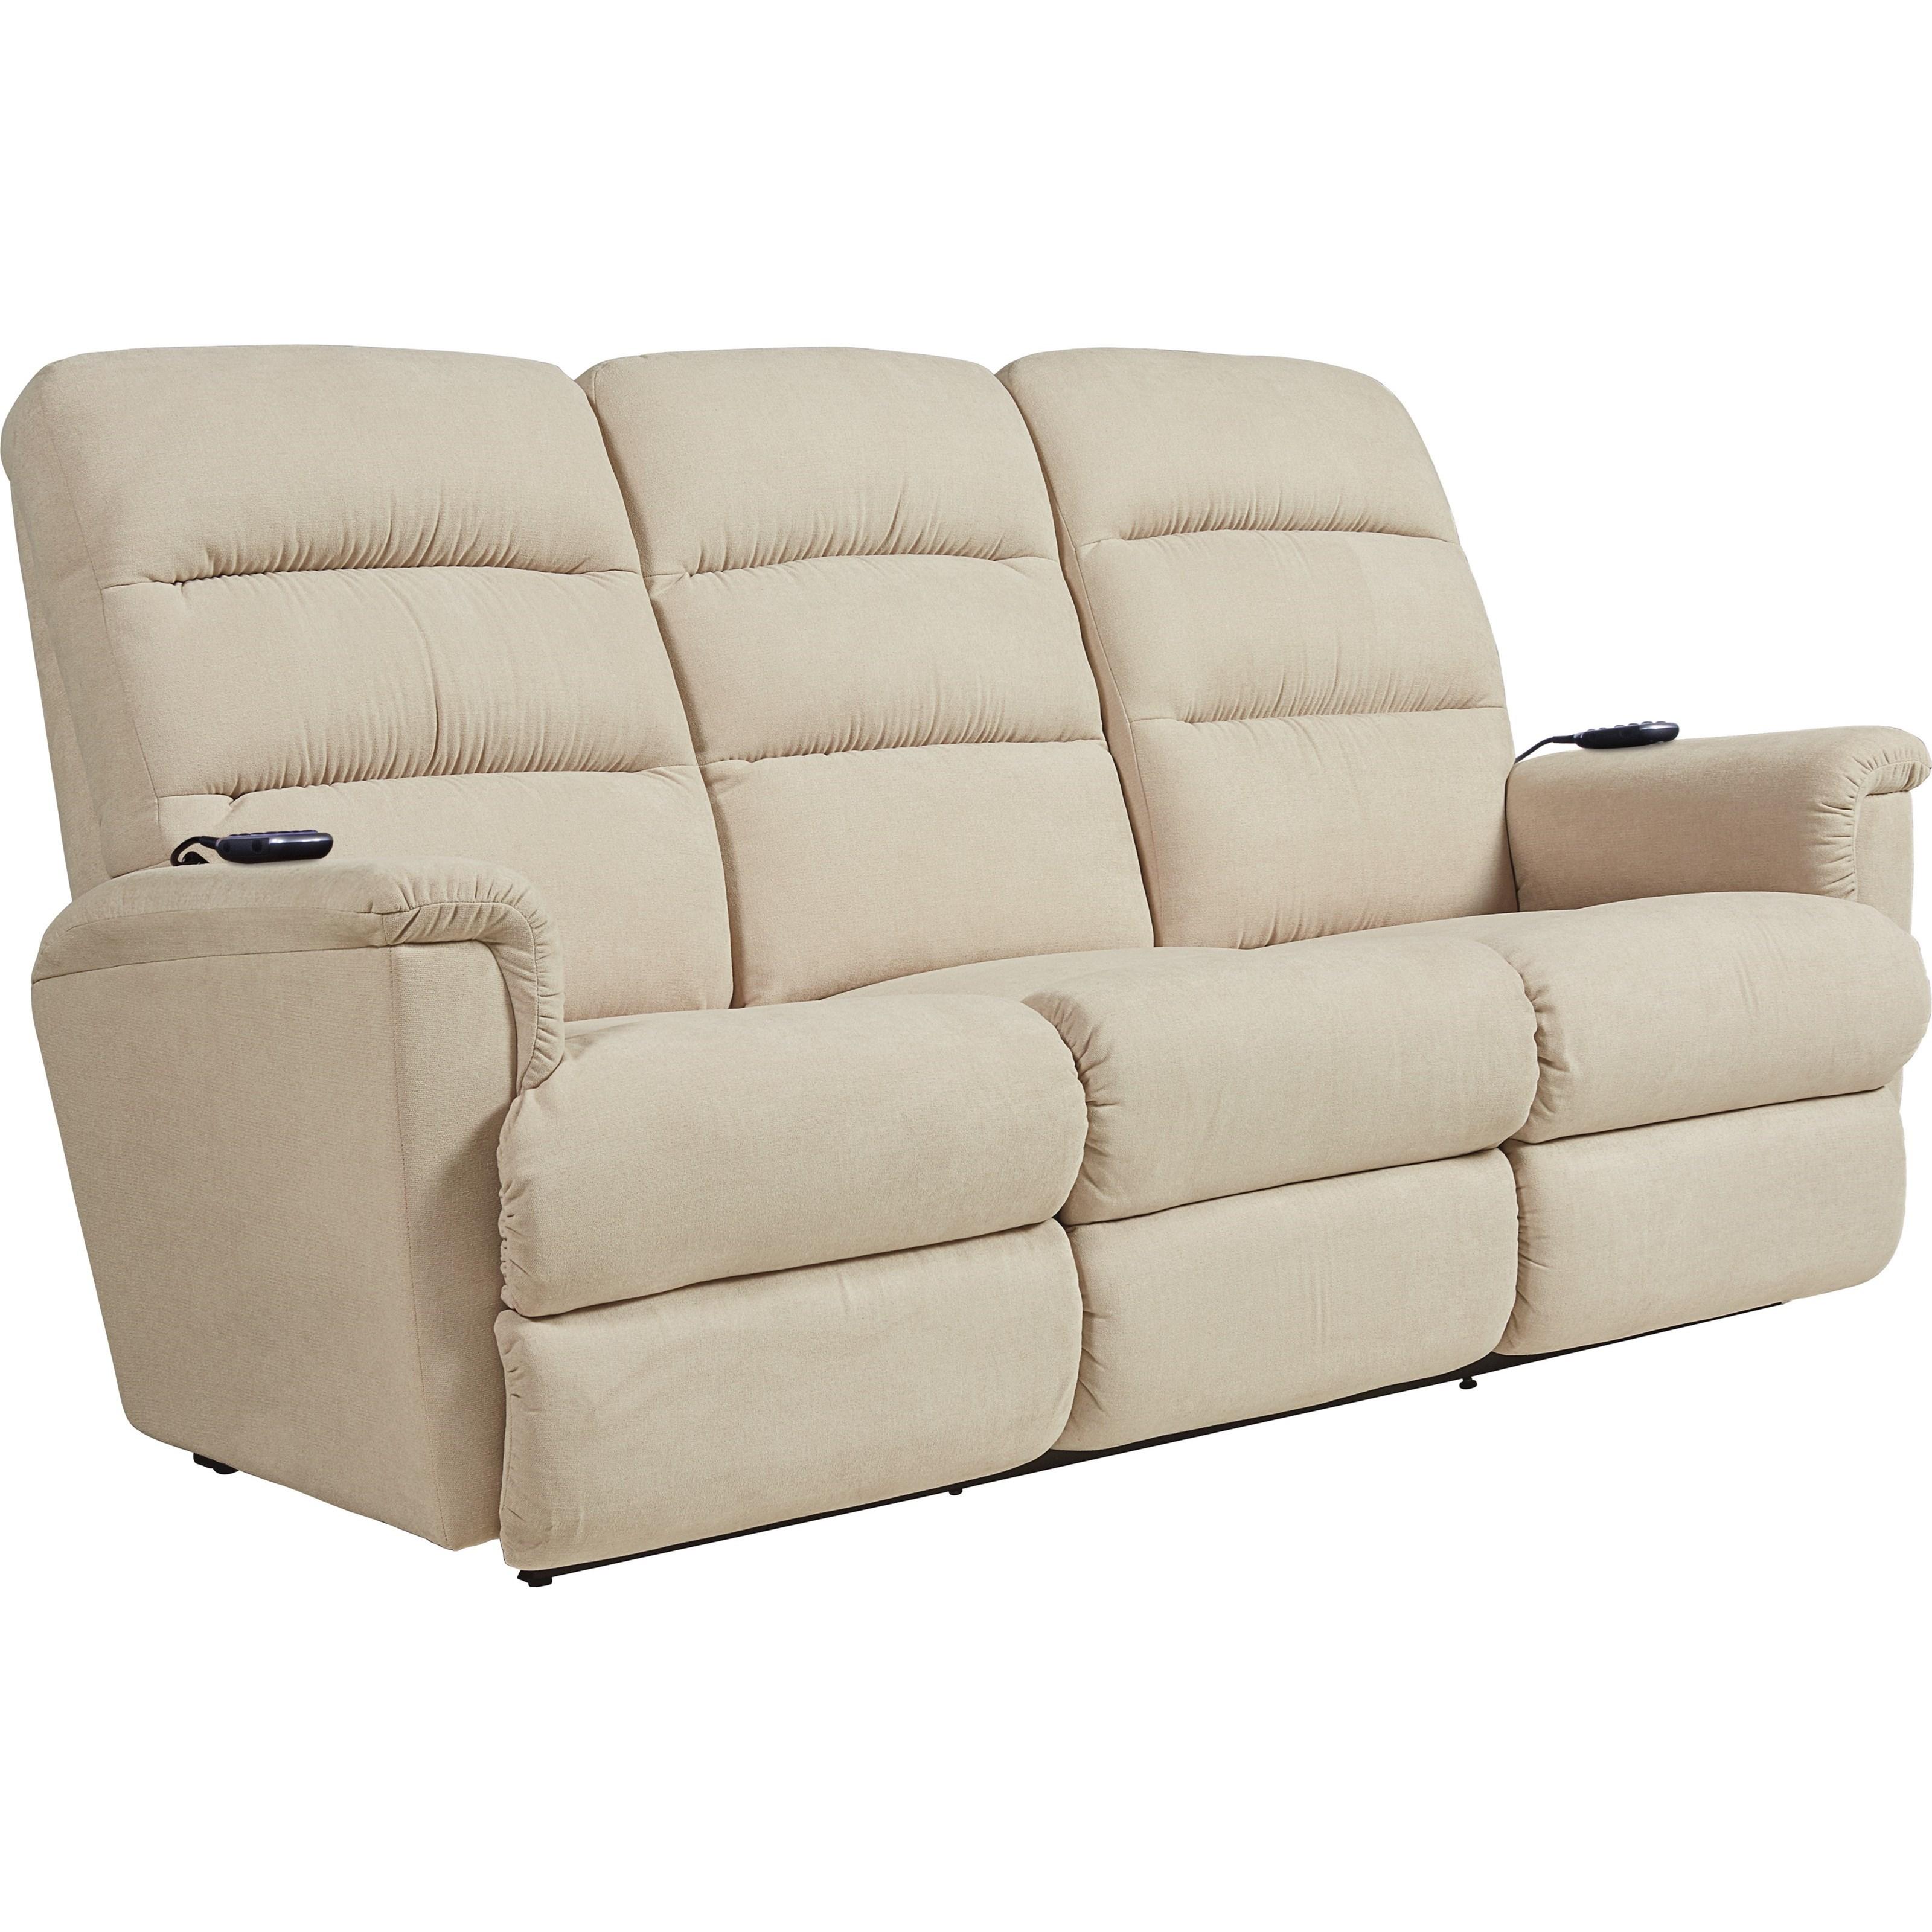 Tripoli Power-Recline-XRw™+ Full Reclining Sofa by La-Z-Boy at Sparks HomeStore